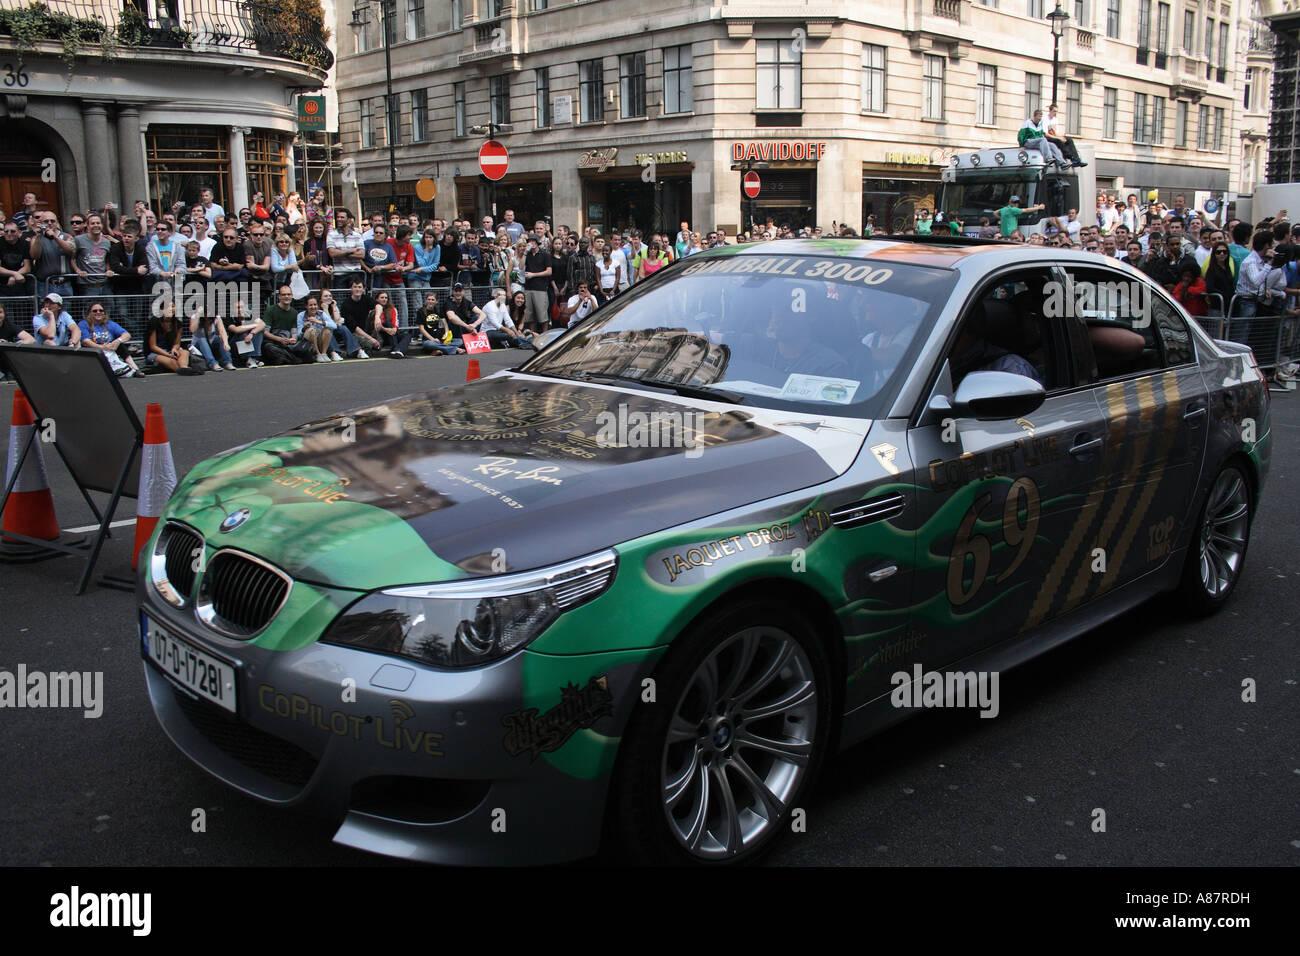 BMW M5 Team 69 Team Irland Fahrer Tom Bailey Jeff Bailey Paul Finlay Diego Macari Stockbild